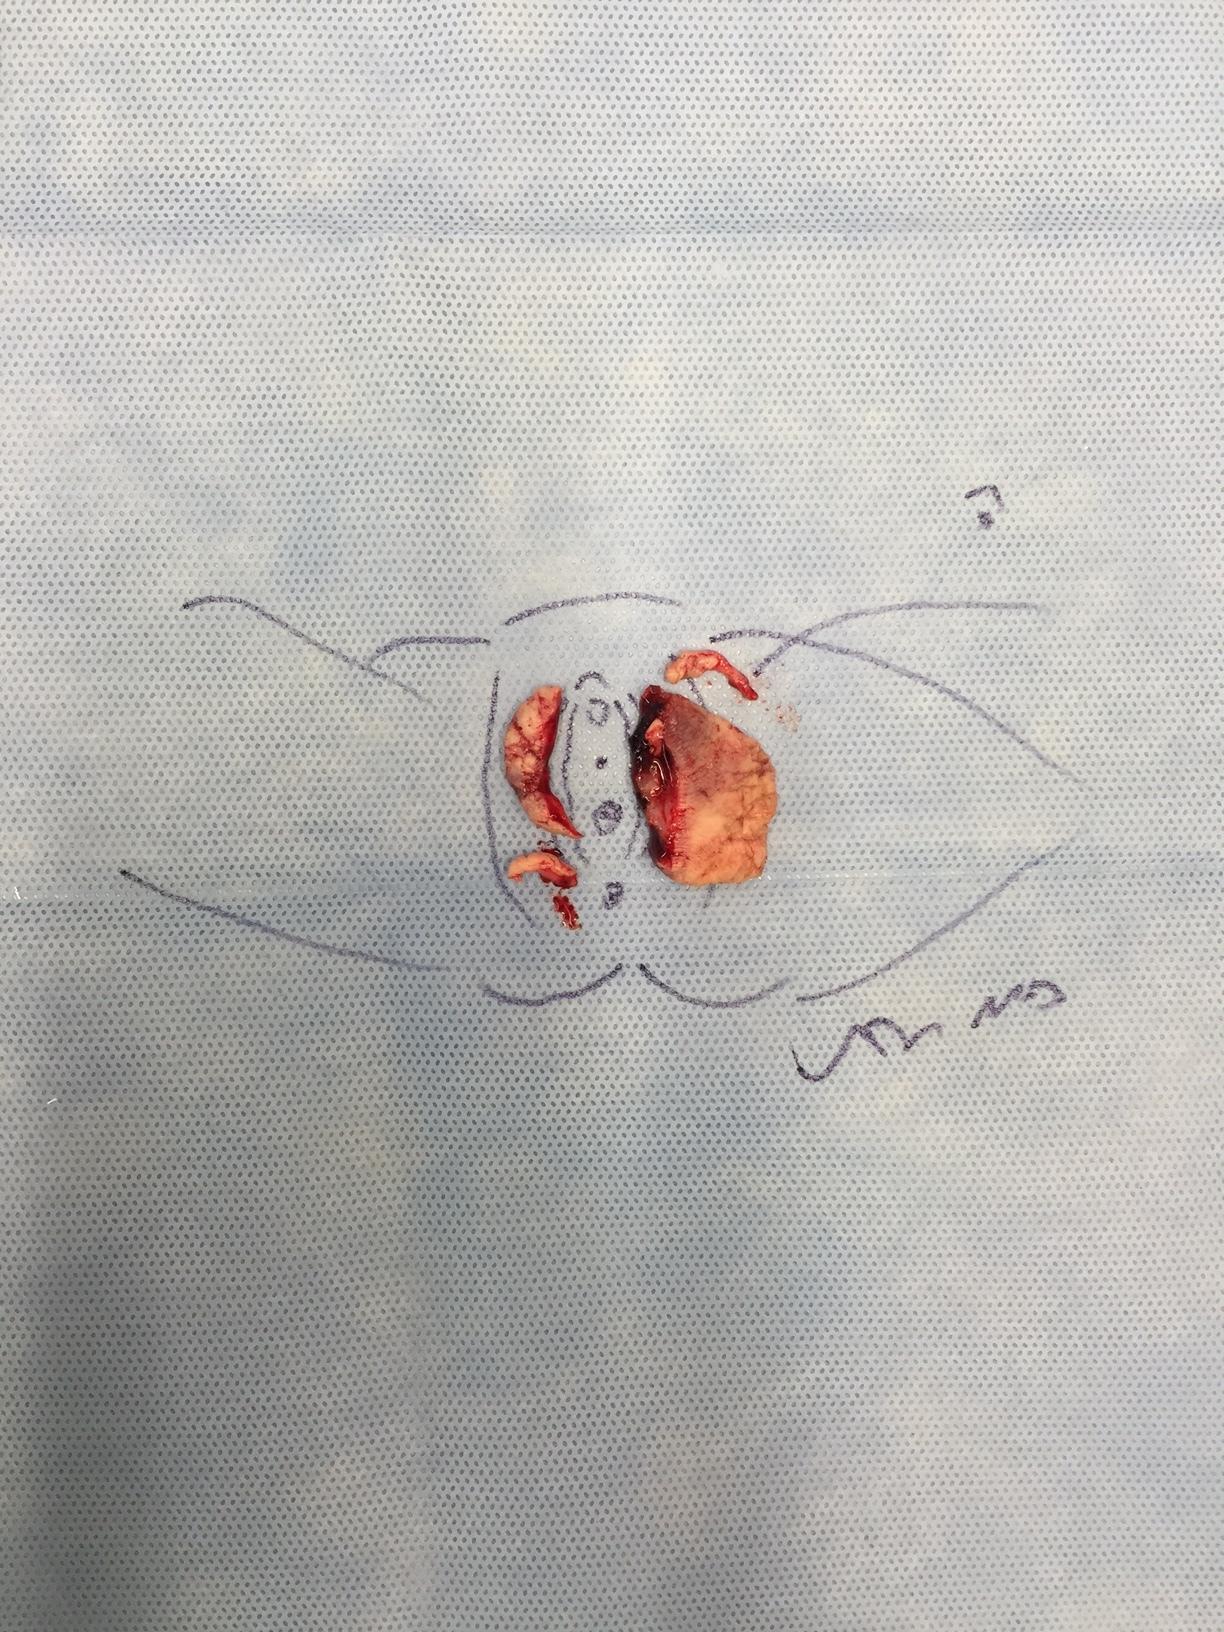 Surgical specimen from a recent labiaplasty patient of Dr. Devgan